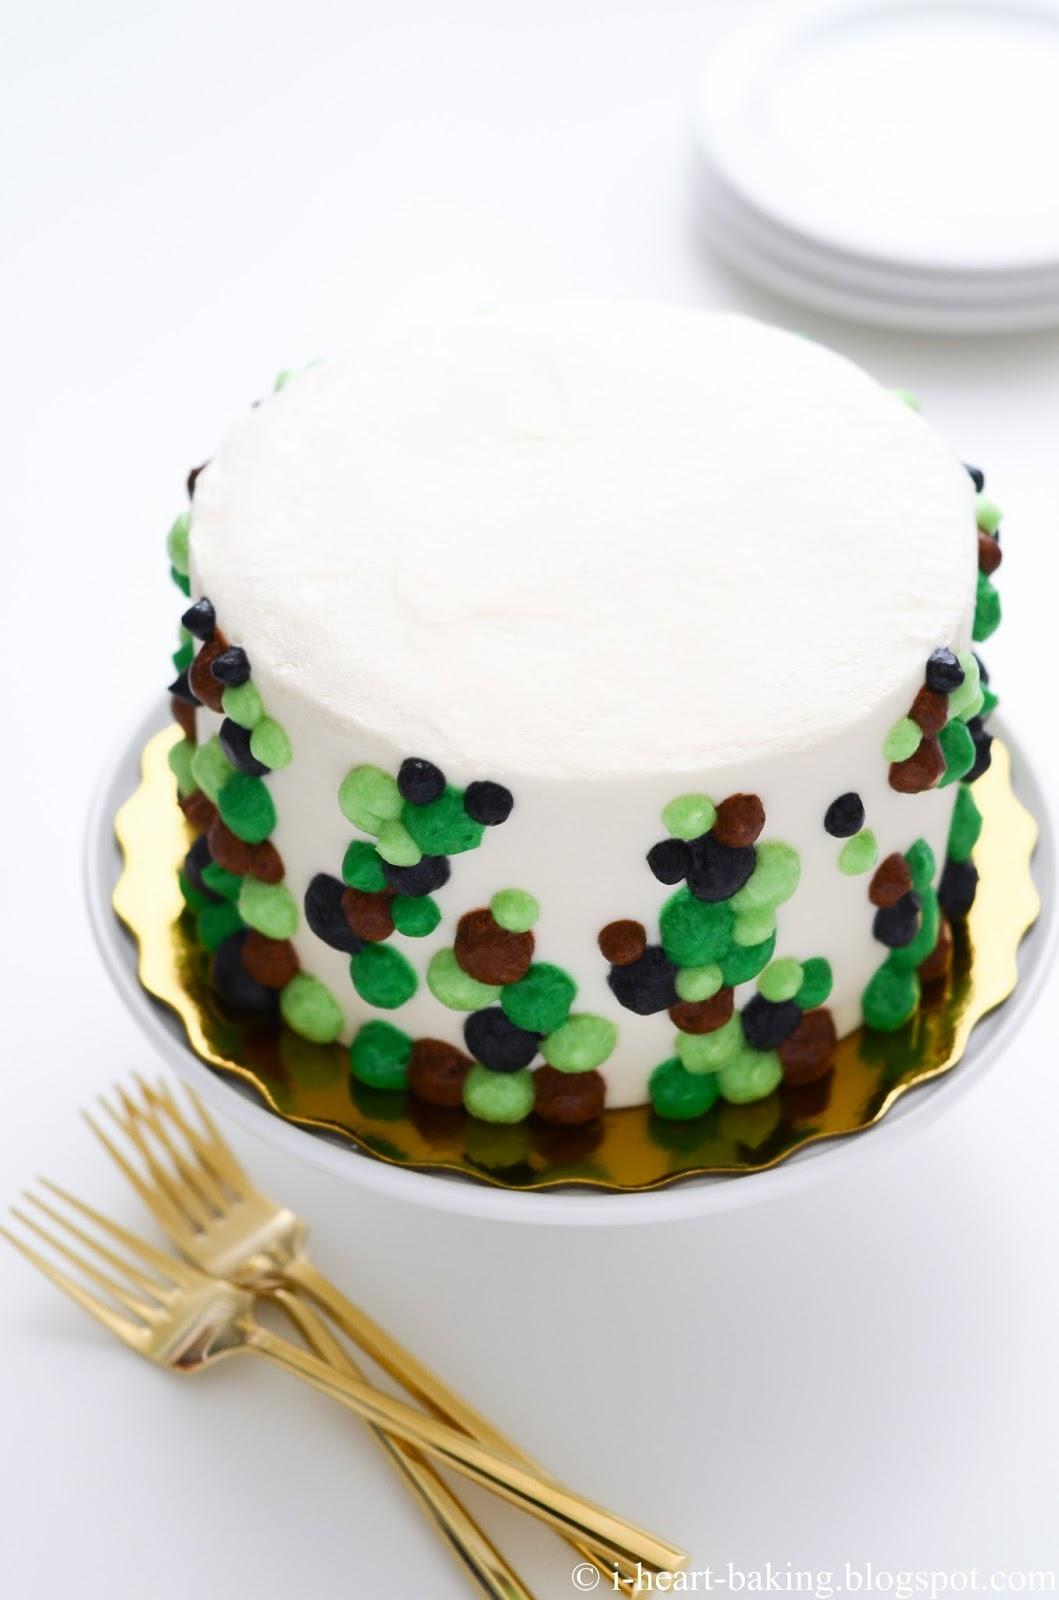 I Heart Baking Camouflage Inspired Polka Dot Birthday Cake